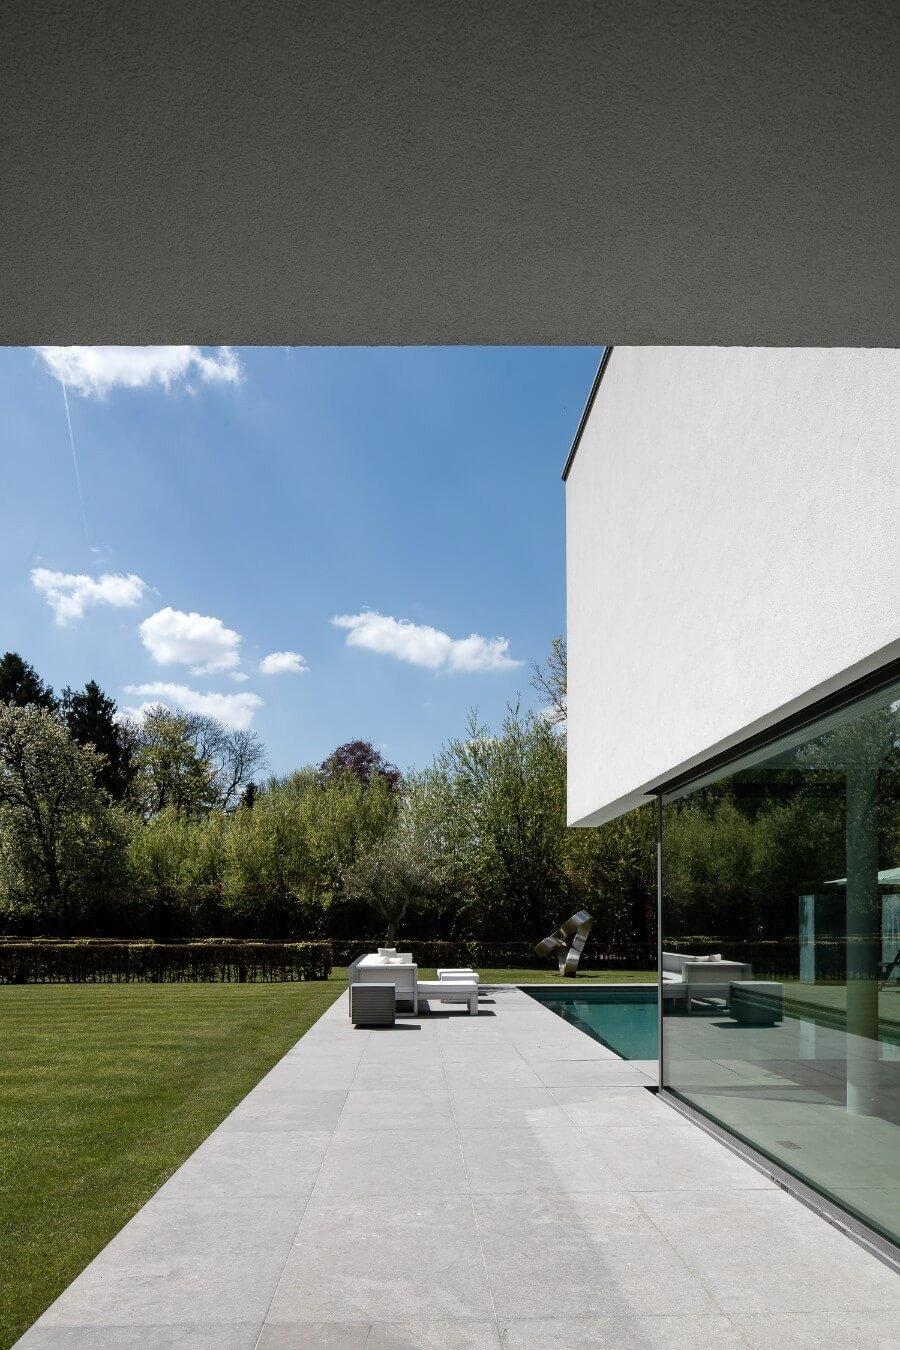 House-MP-Rietveldprojects-Photobycafeine-34